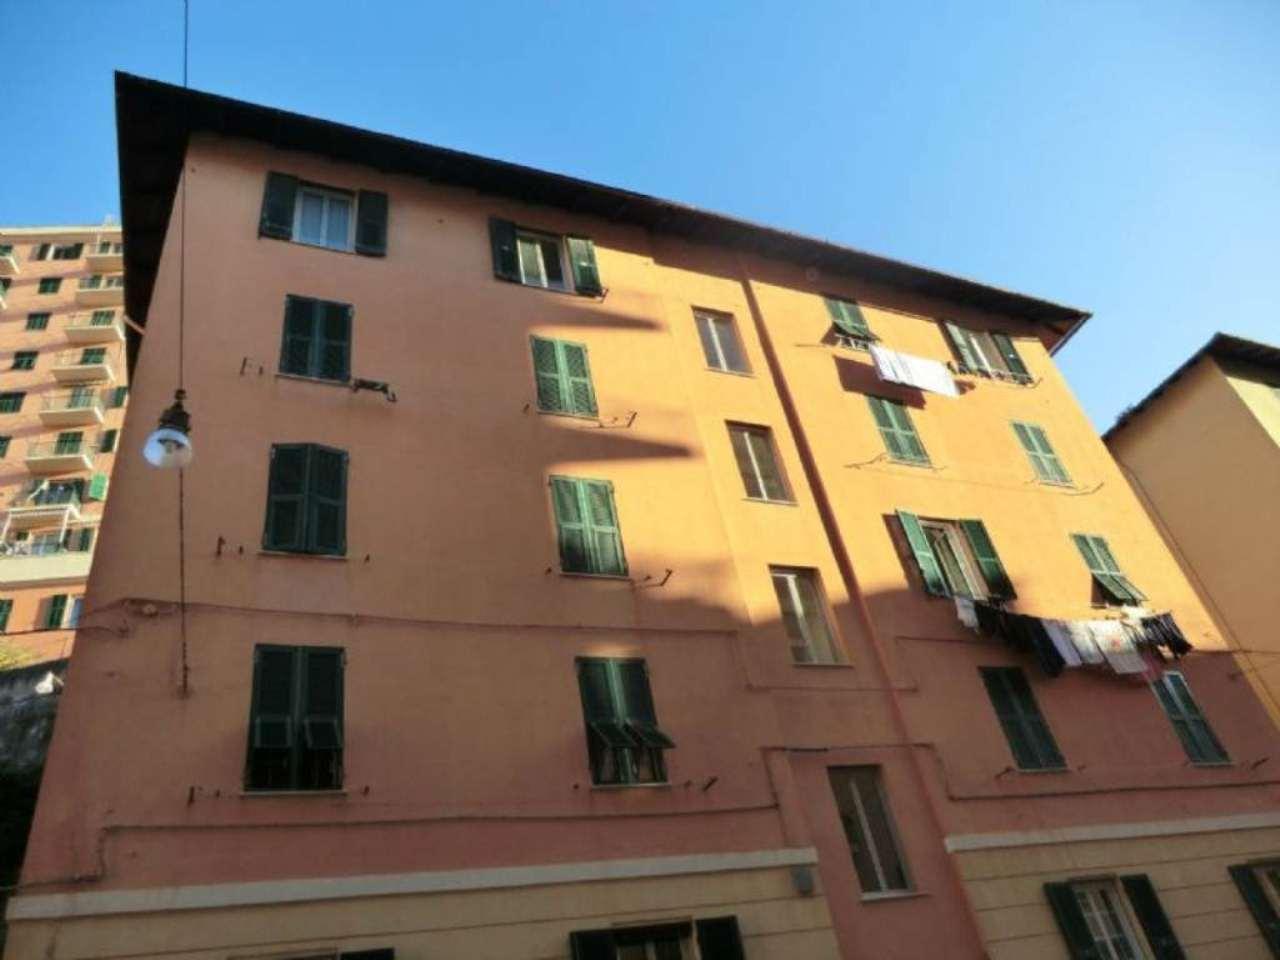 Bilocale Genova Via Ponza 1